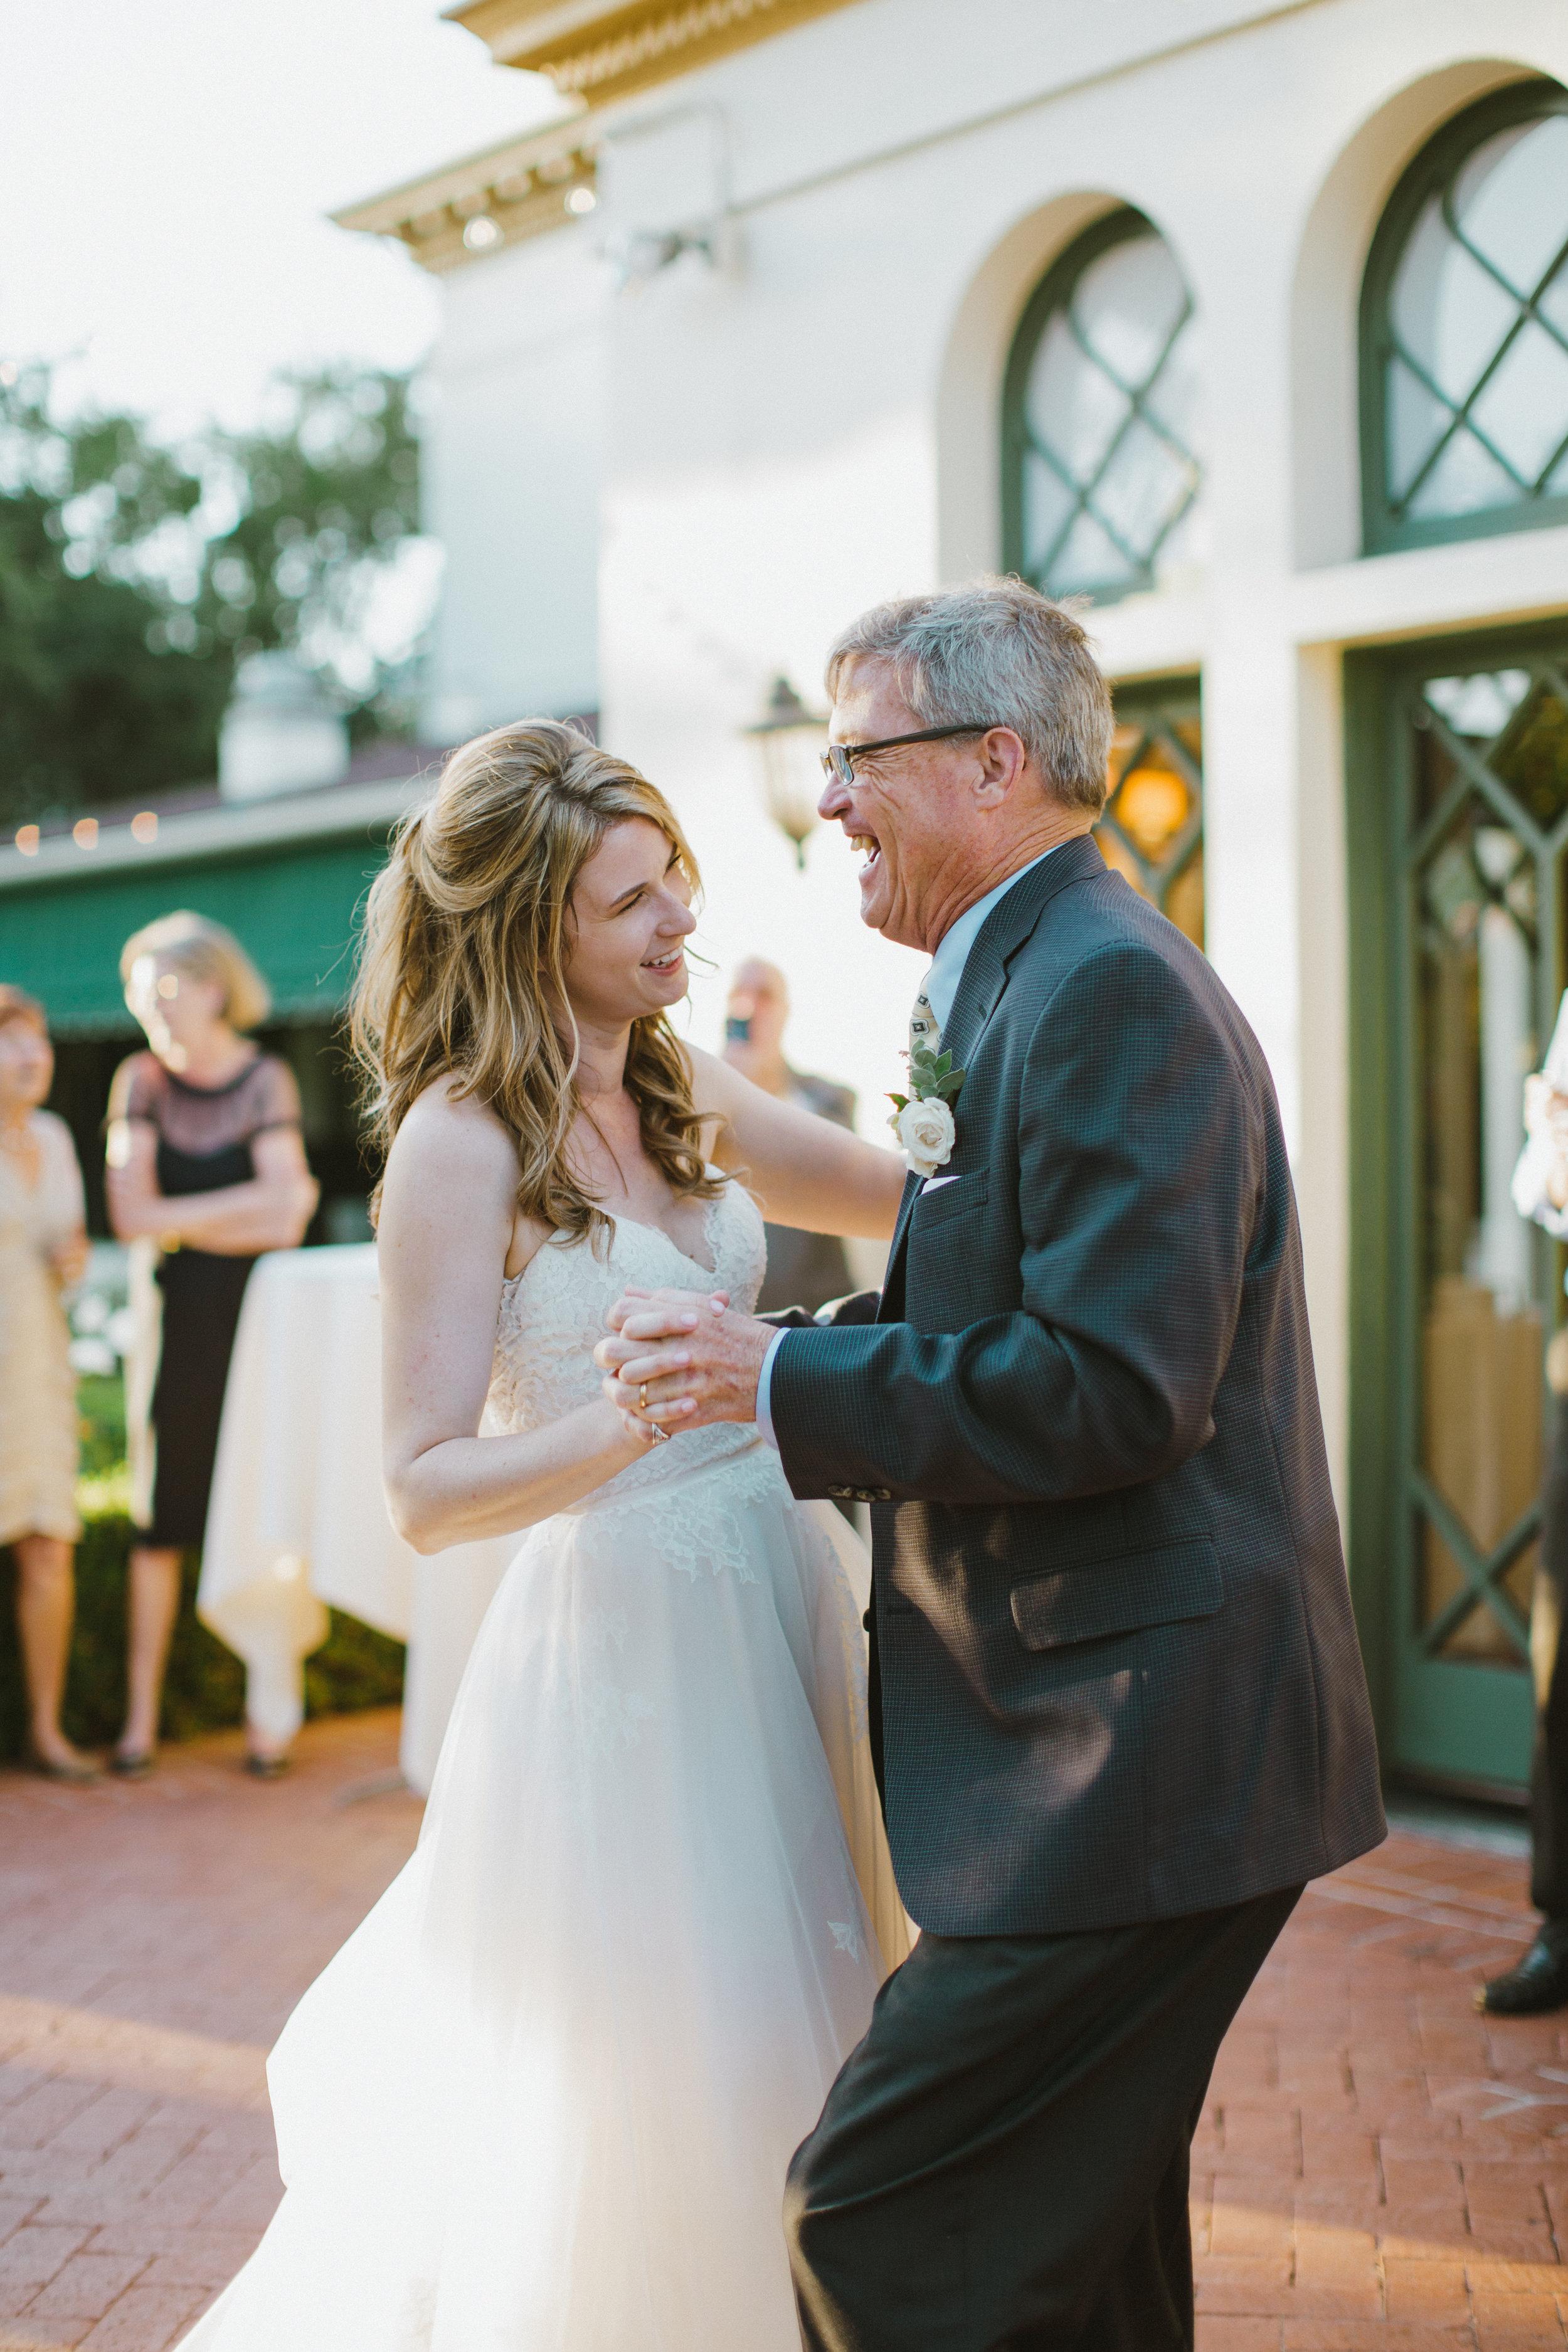 www.santabarbarawedding.com | Ryanne Bee Photography | The Santa Barbara Club | The Wedding Expert DJ | Bride Shares a Dance with Her Dad